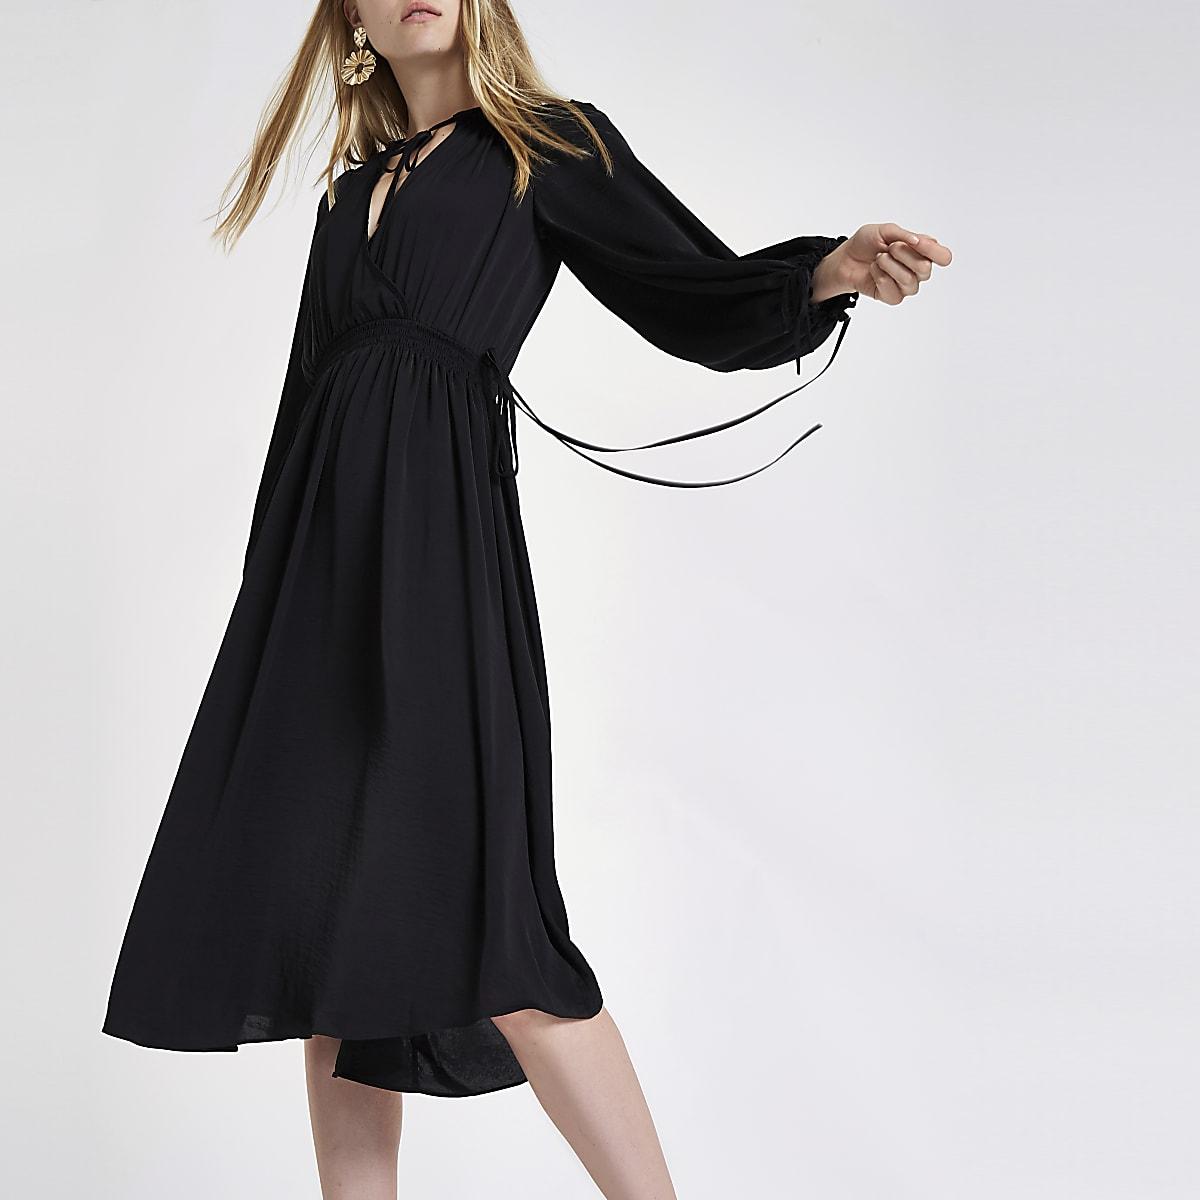 85e7c83acf4 Black shirred waist smock midi dress - Swing Dresses - Dresses - women